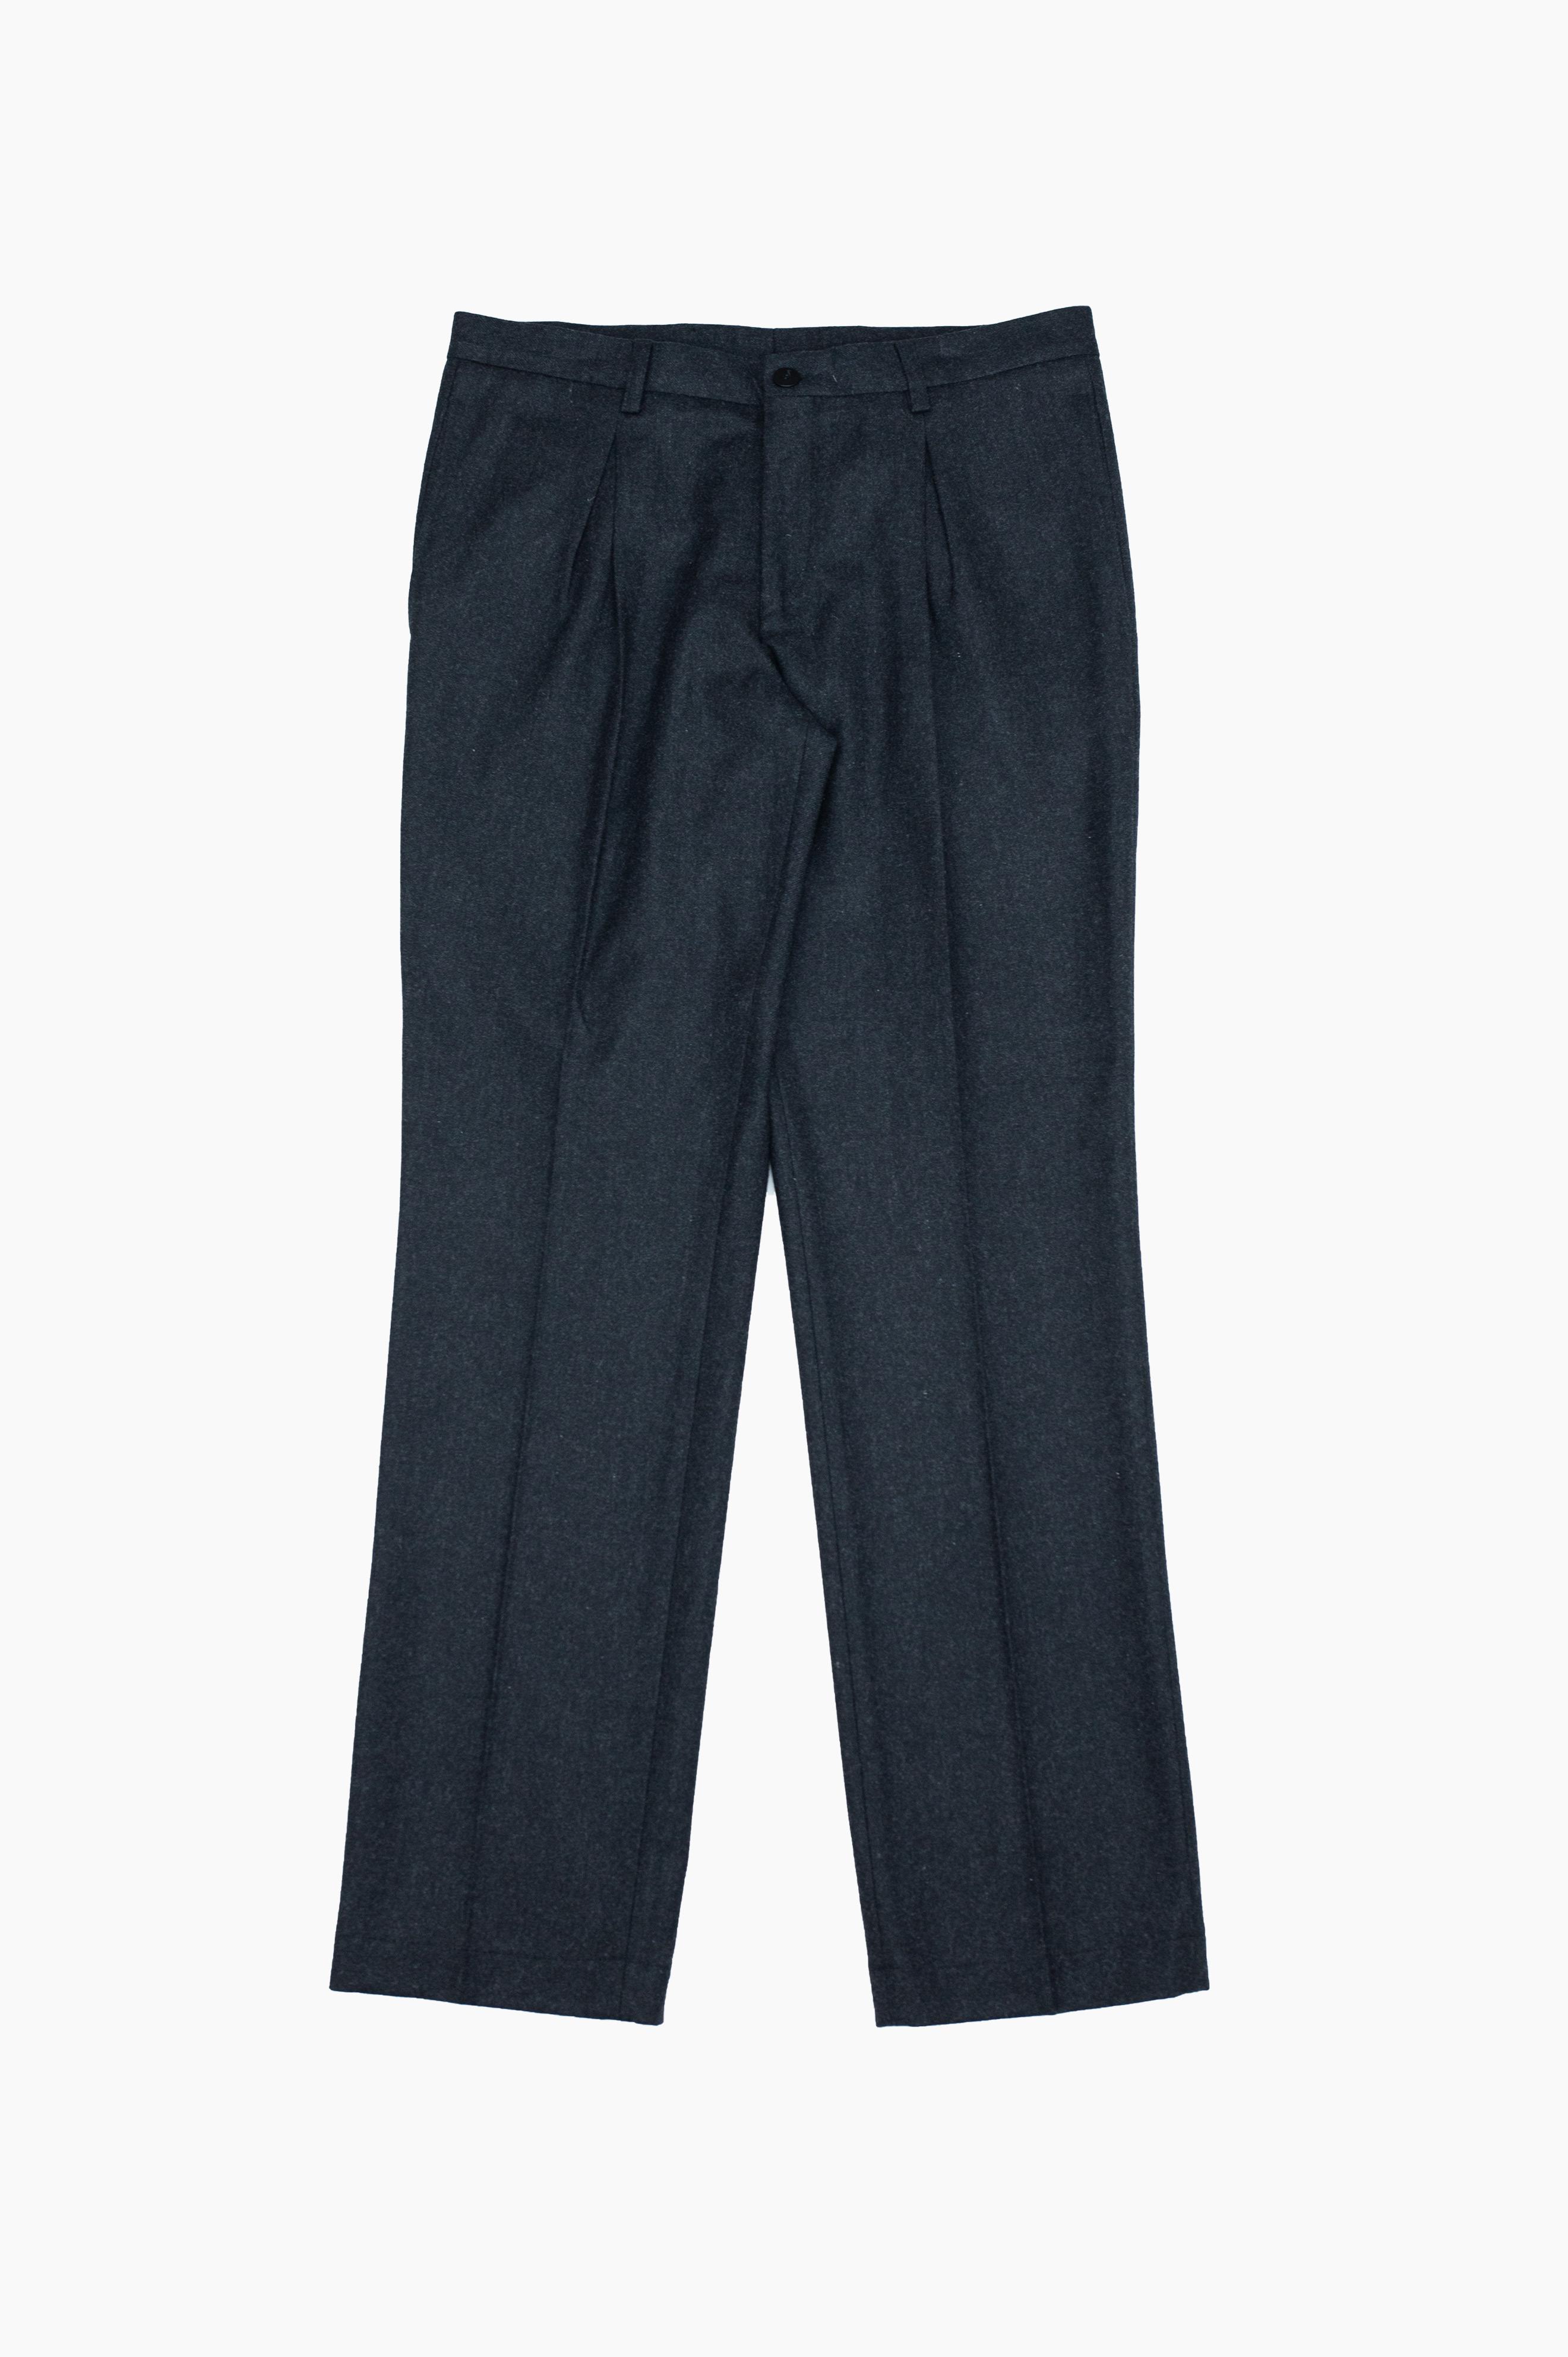 Setas Trousers Black Mesc